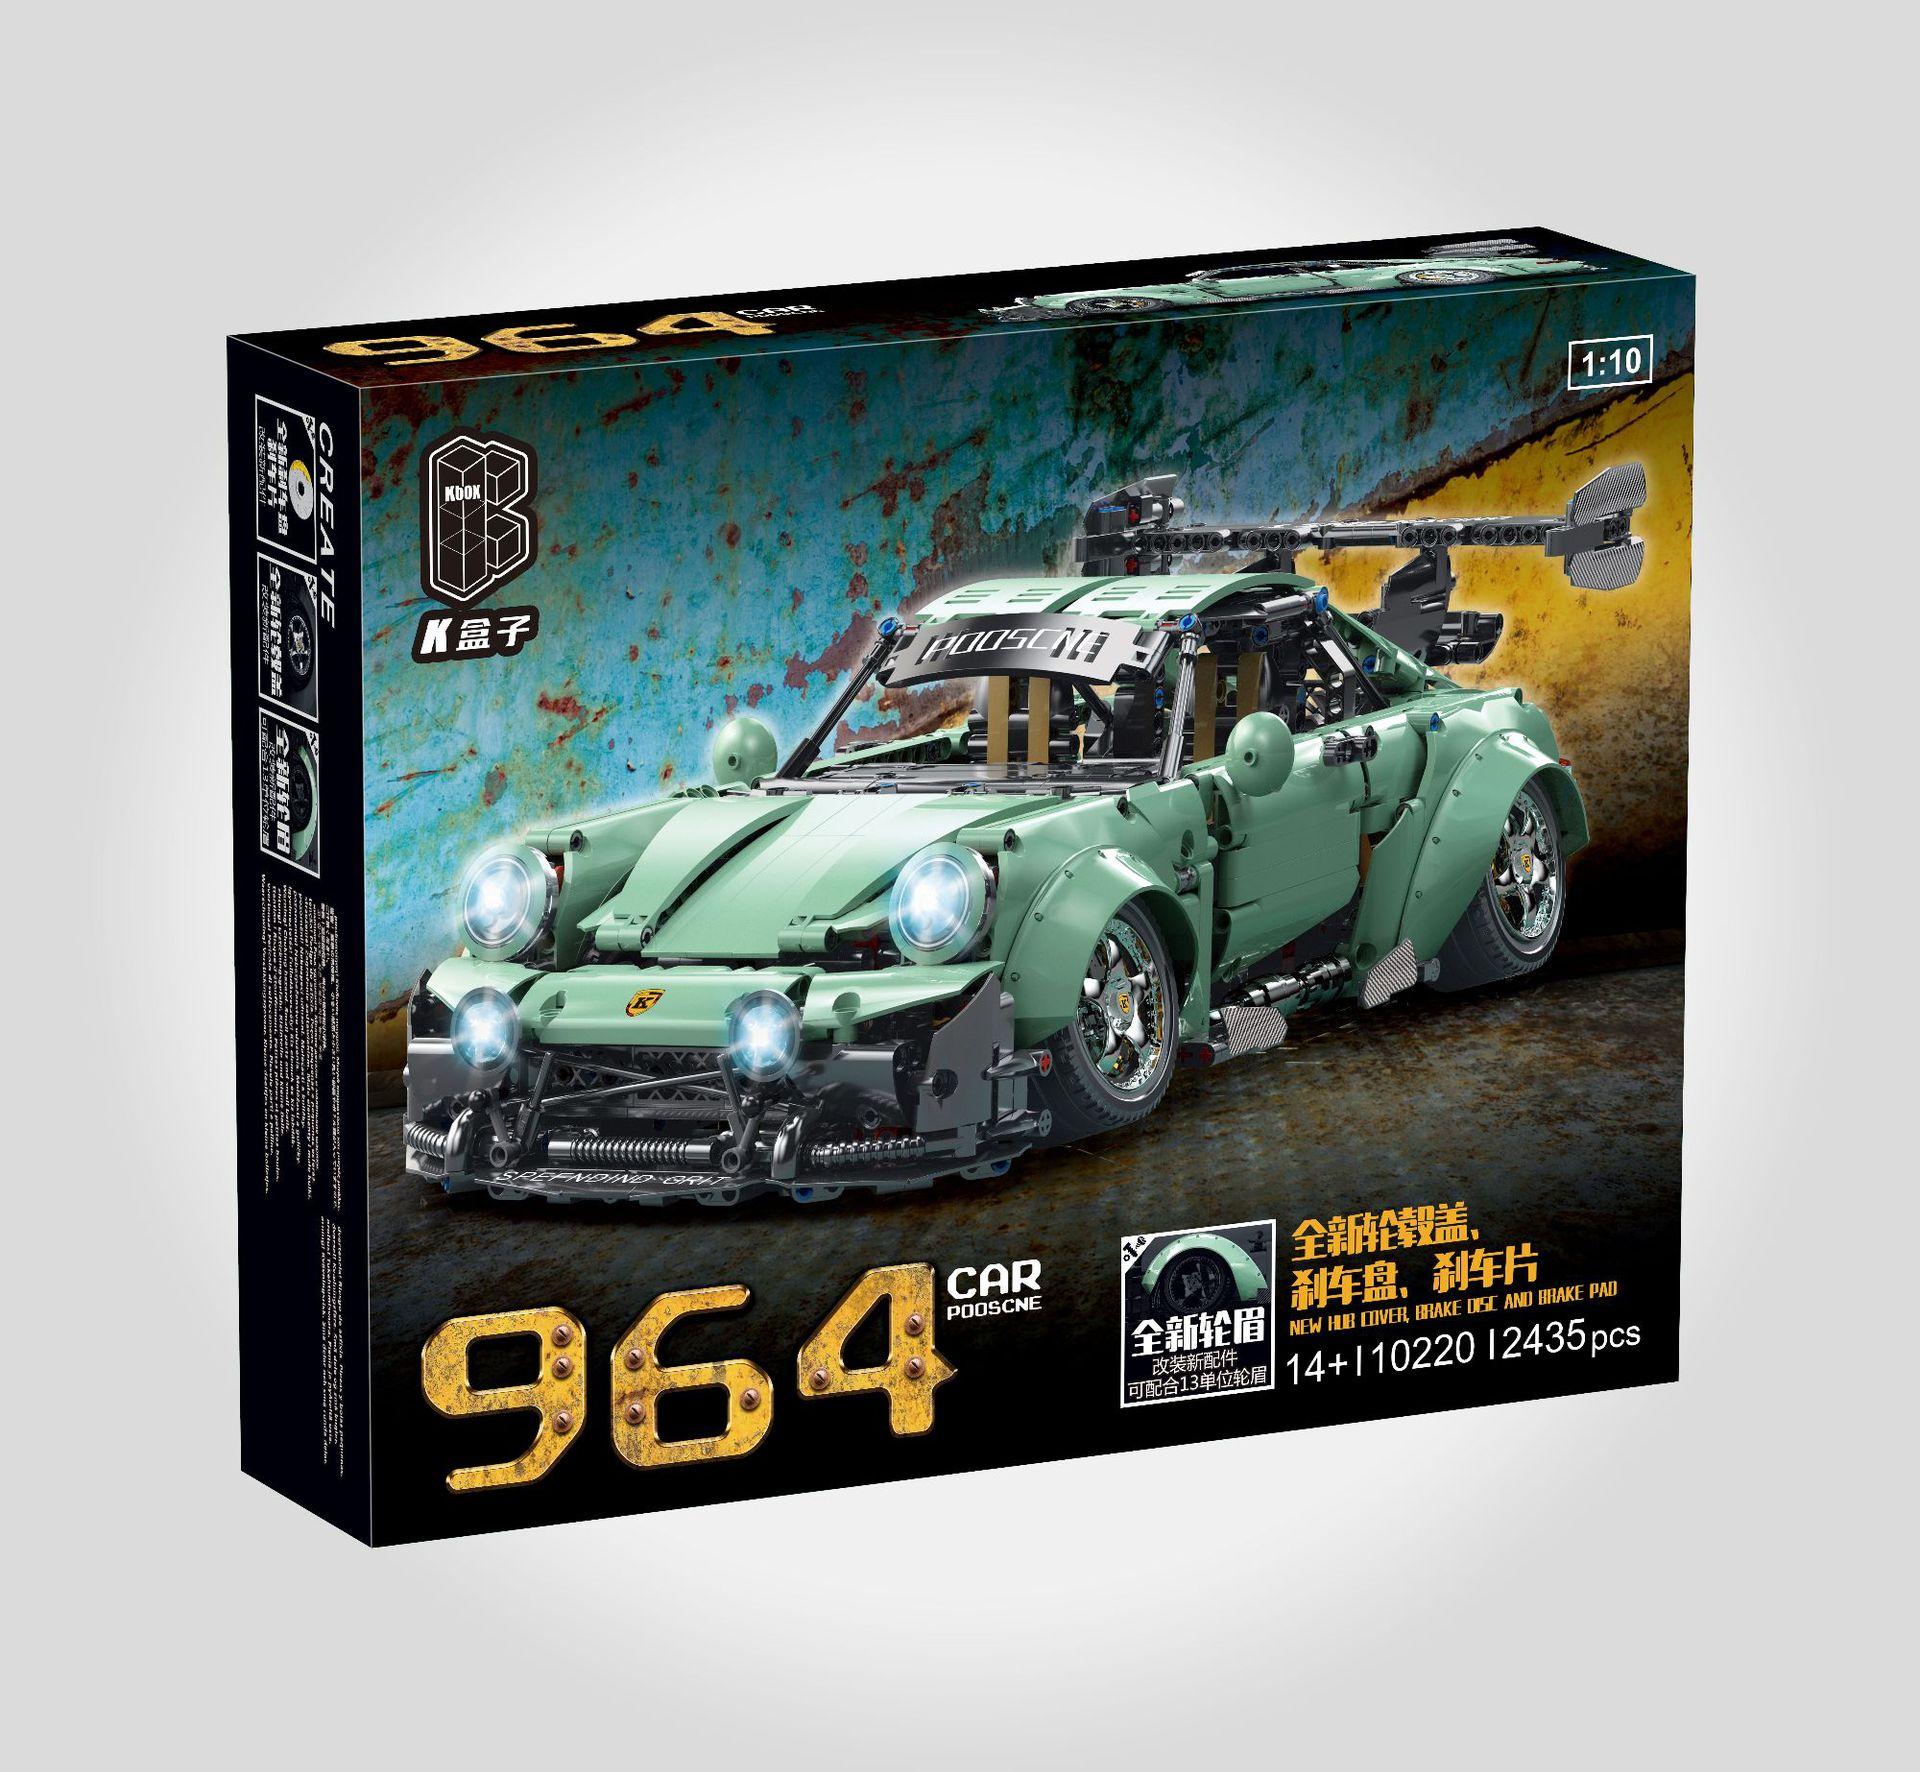 K盒子10220科技机械宝时捷964低趴跑车模型儿童益智拼装积木玩具